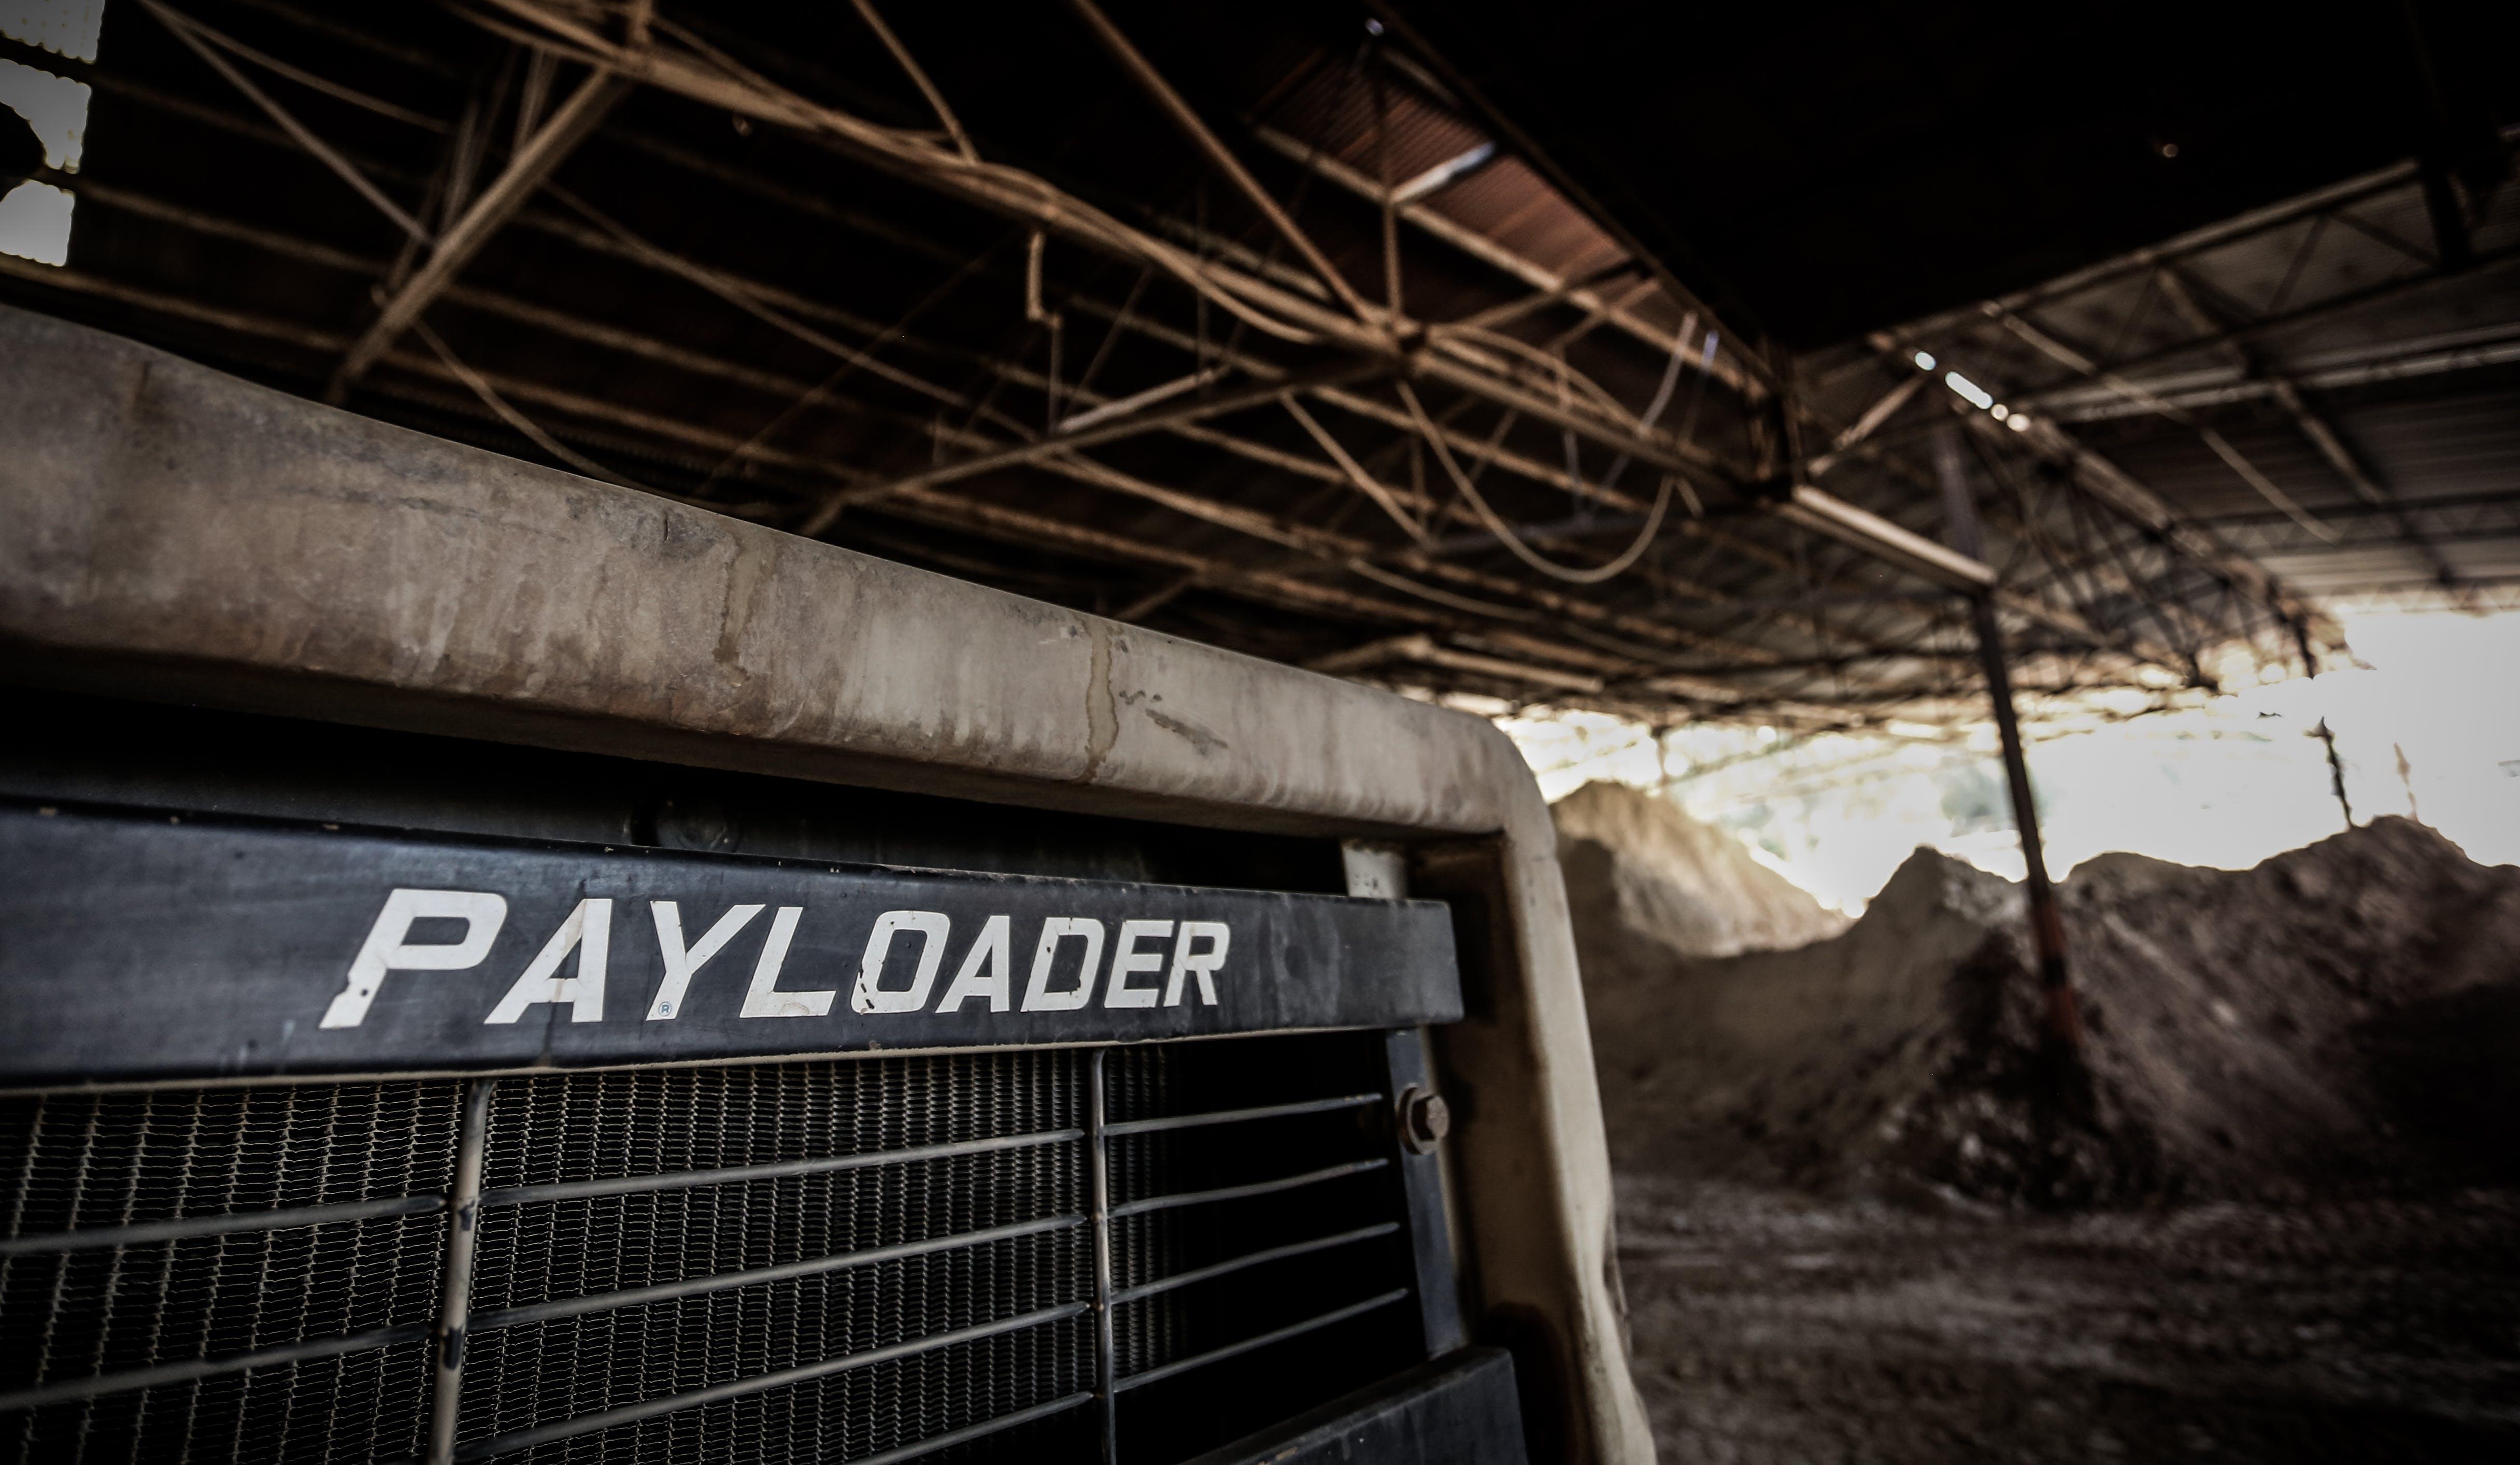 jordmobilister, lager, lastare